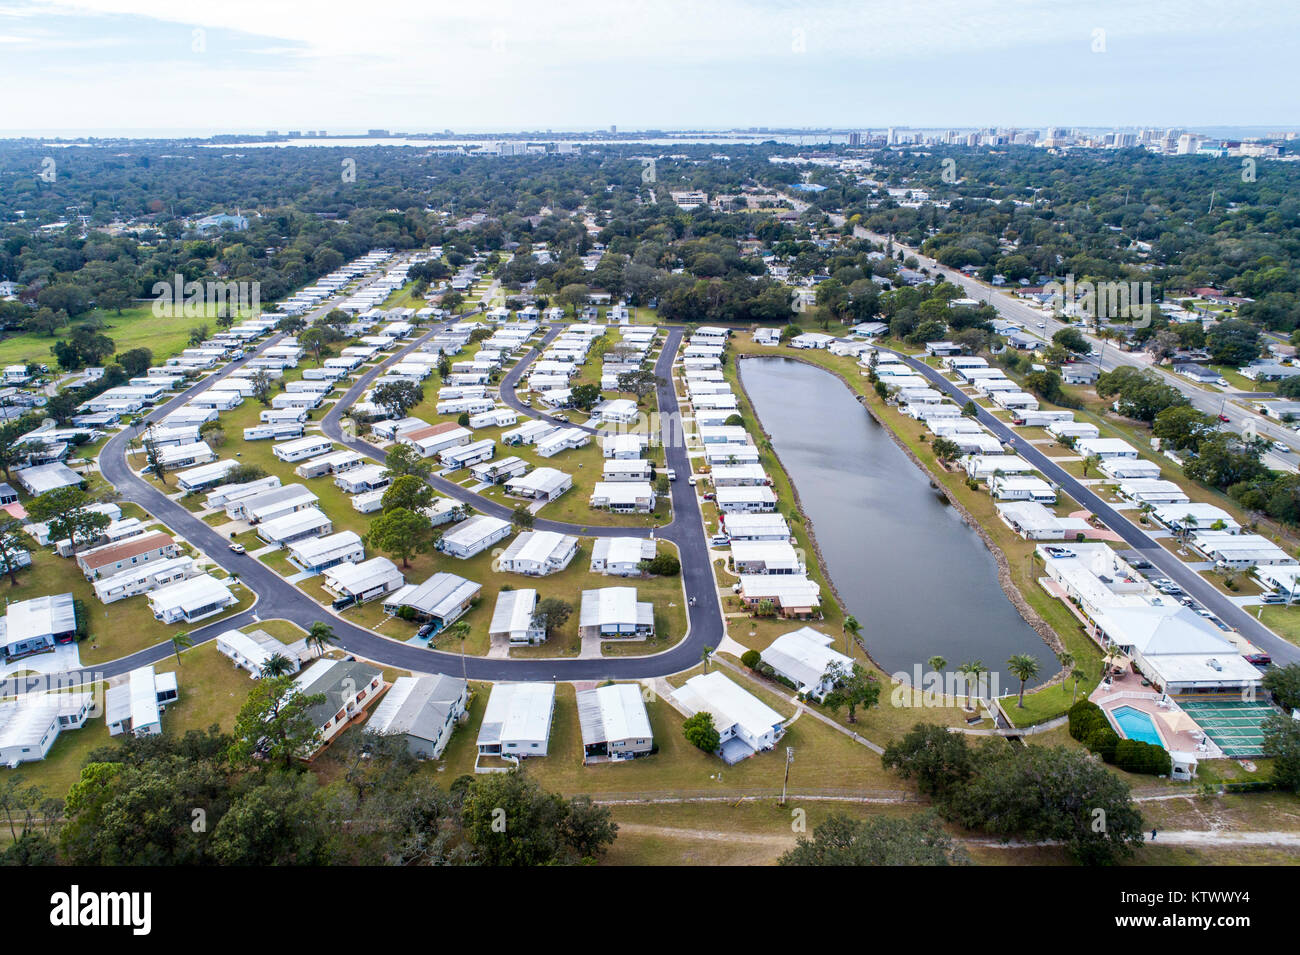 Florida Sarasota Saralake Estates Mobile Home Park aerial overhead on rv parks sarasota fl, marinas sarasota fl, mobile home parks san jose ca, gated communities sarasota fl, mobile home parks tulsa ok, apartments sarasota fl,